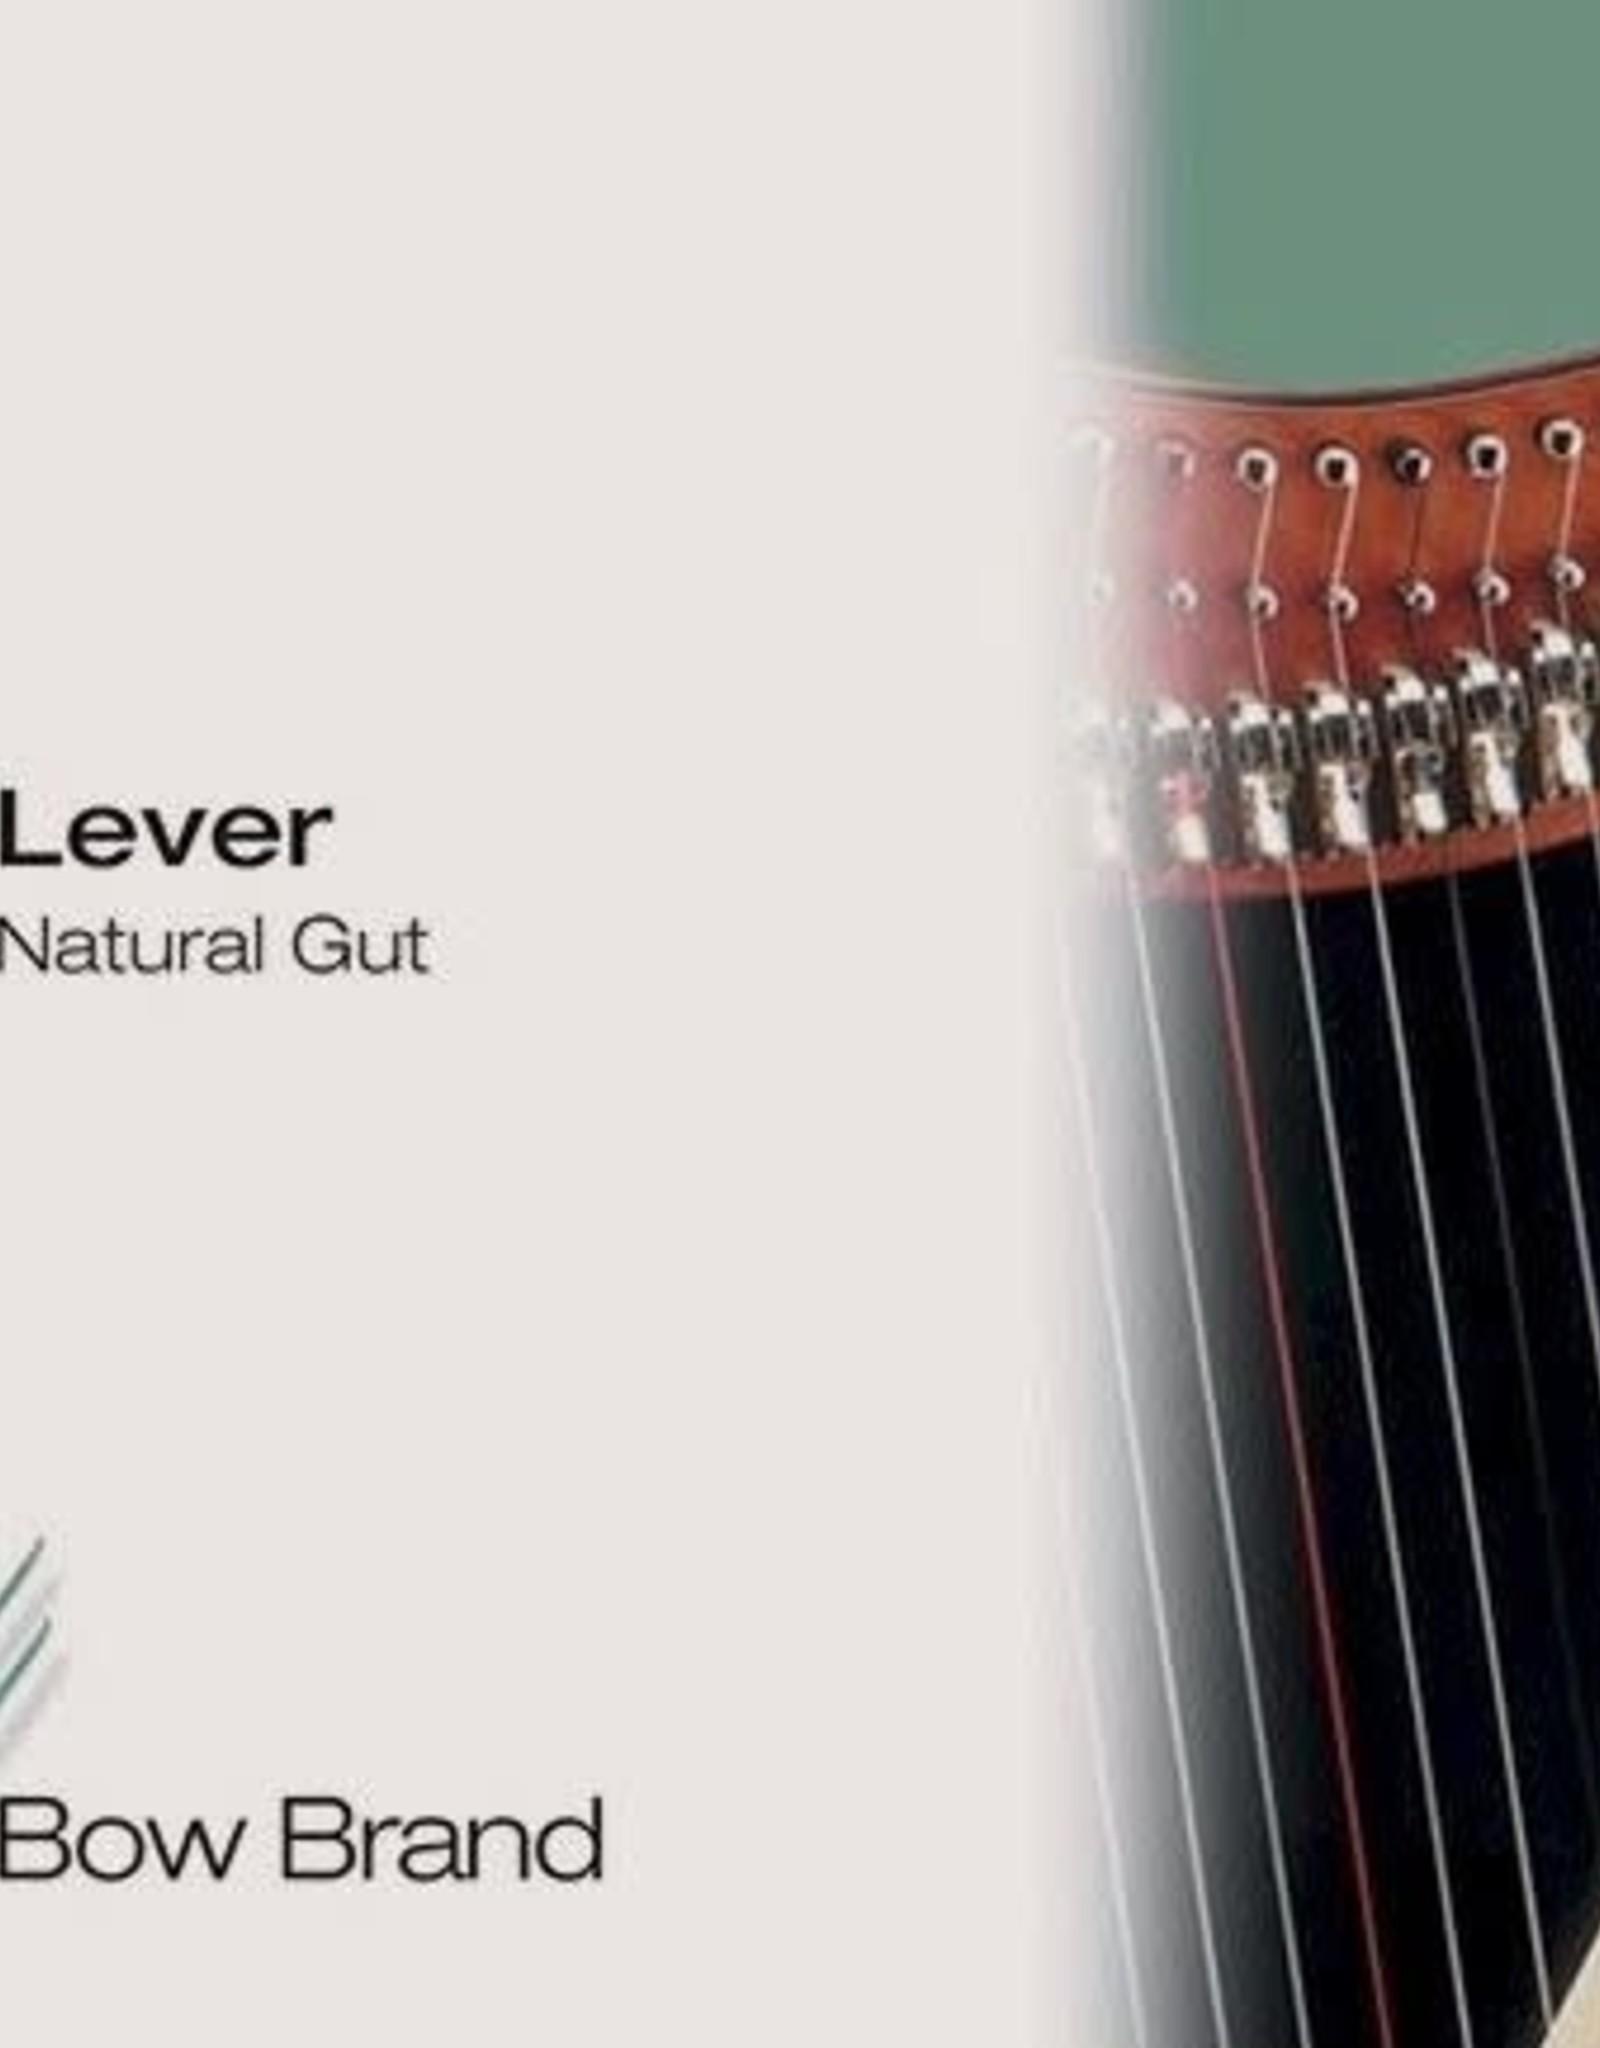 BOW BRAND  klep darm - lever GUT 20/3 sol